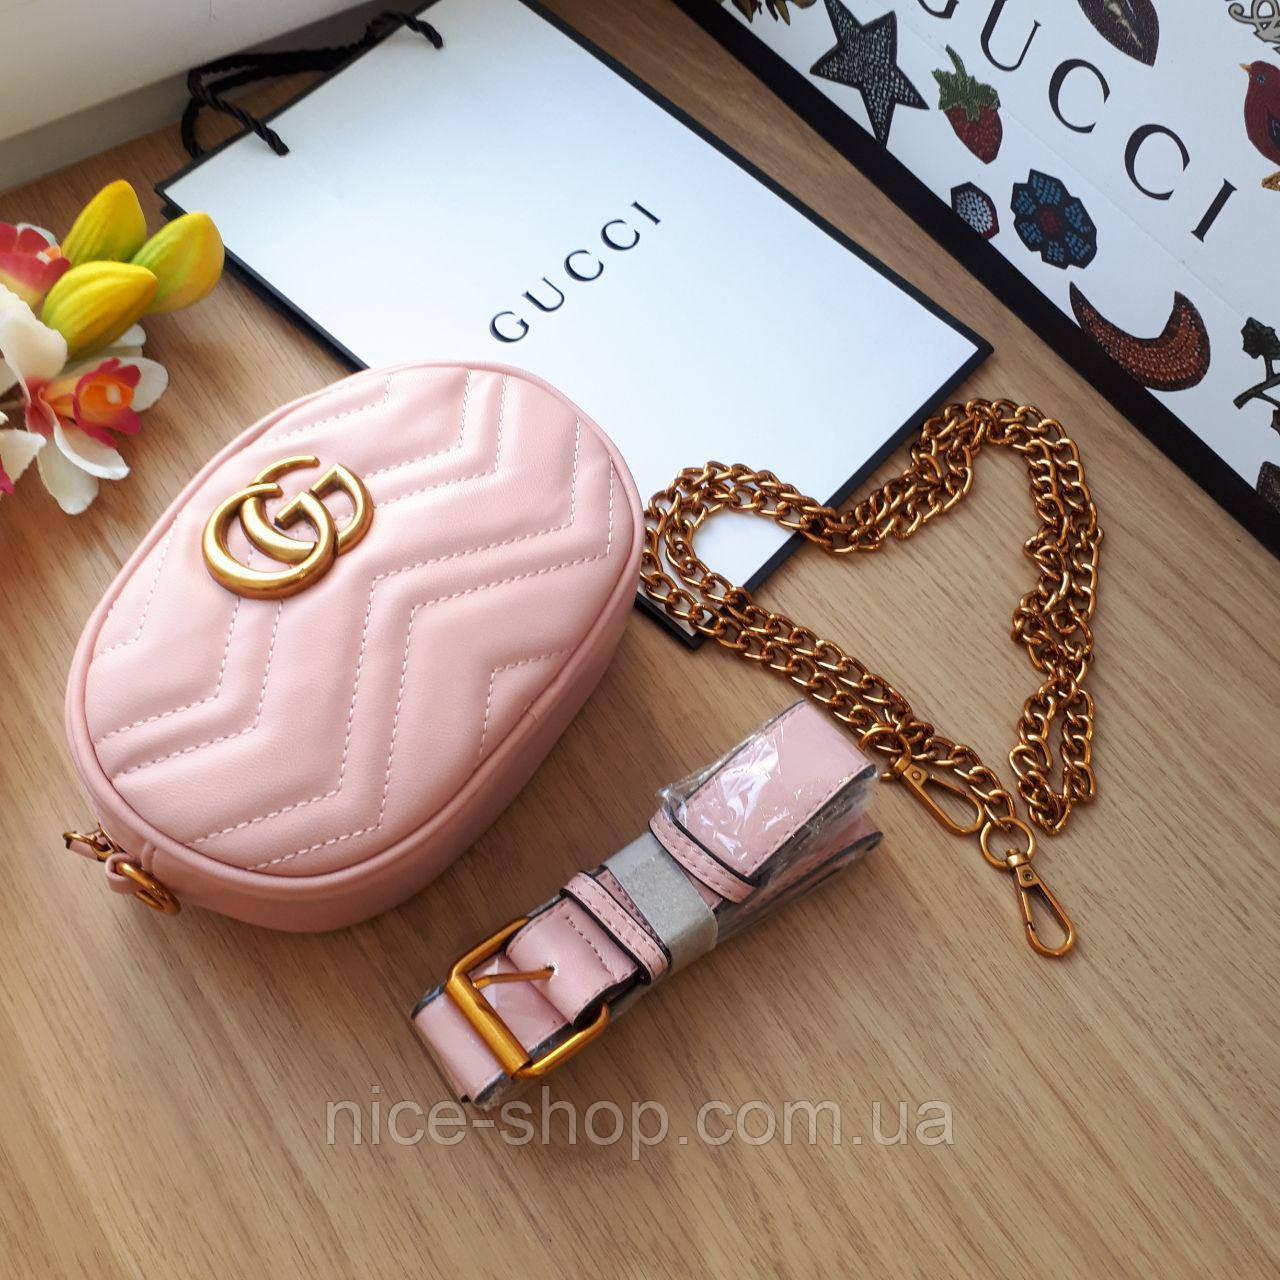 Сумочка-бананка Gucci Marmont розовая, эко-кожа